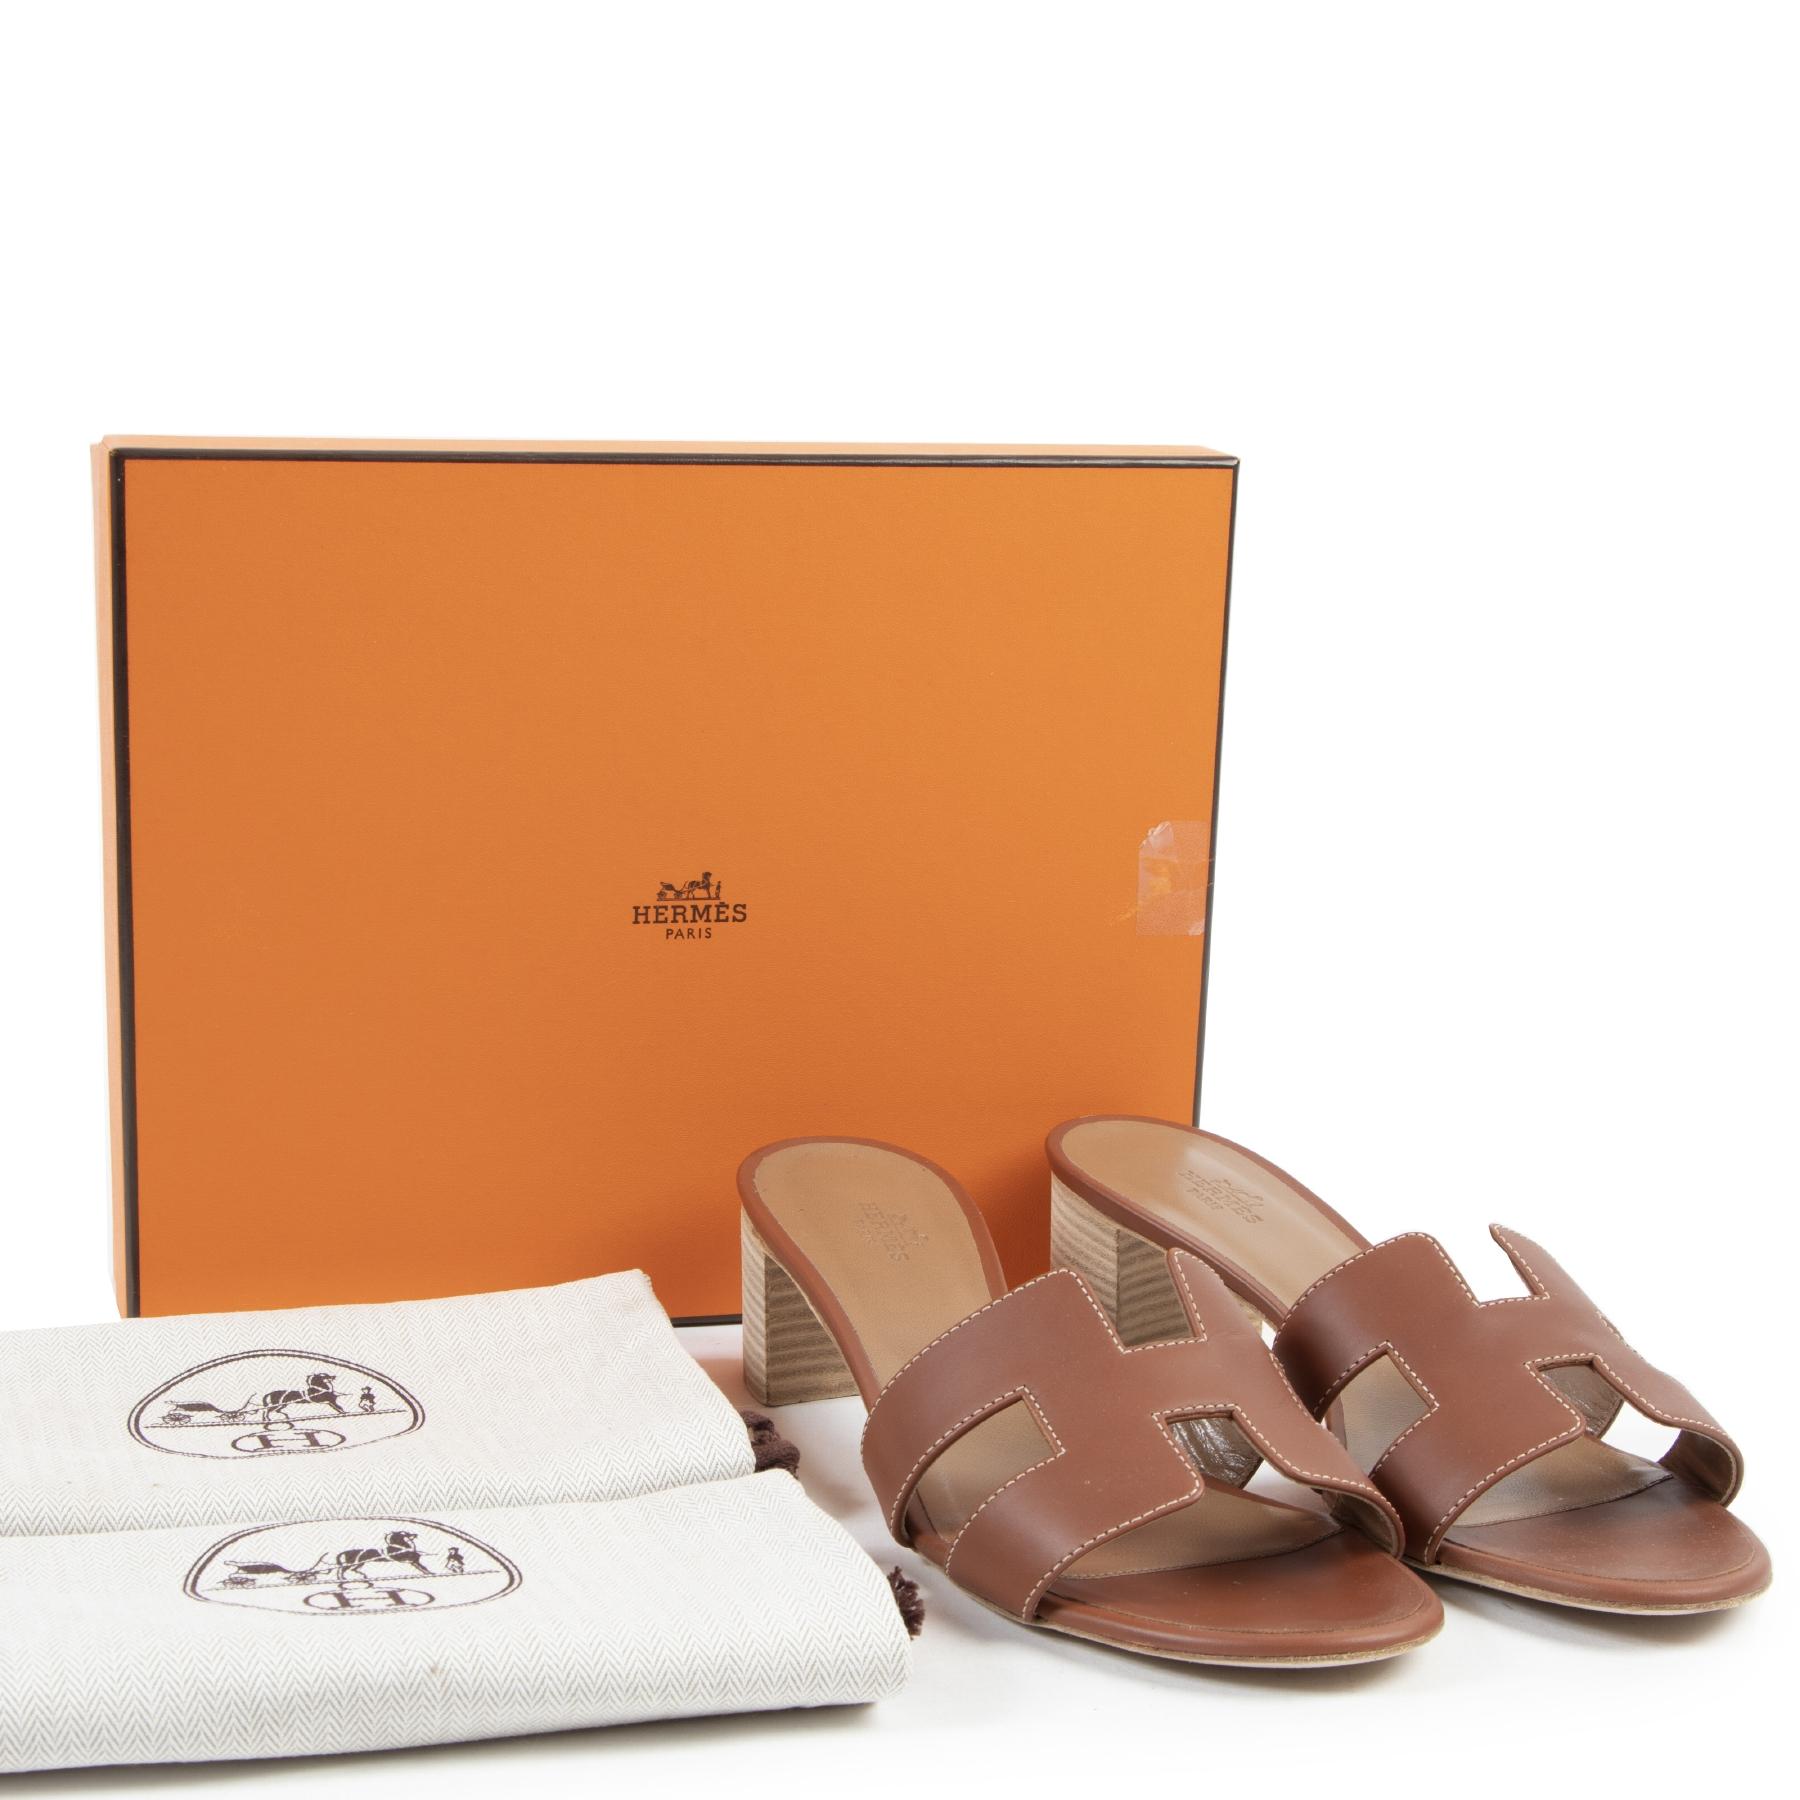 Authentic secondhand Hermes Gold Oasis Sandals - size 41 designer sandals shoes fashion luxury vintage webshop safe secure online shopping